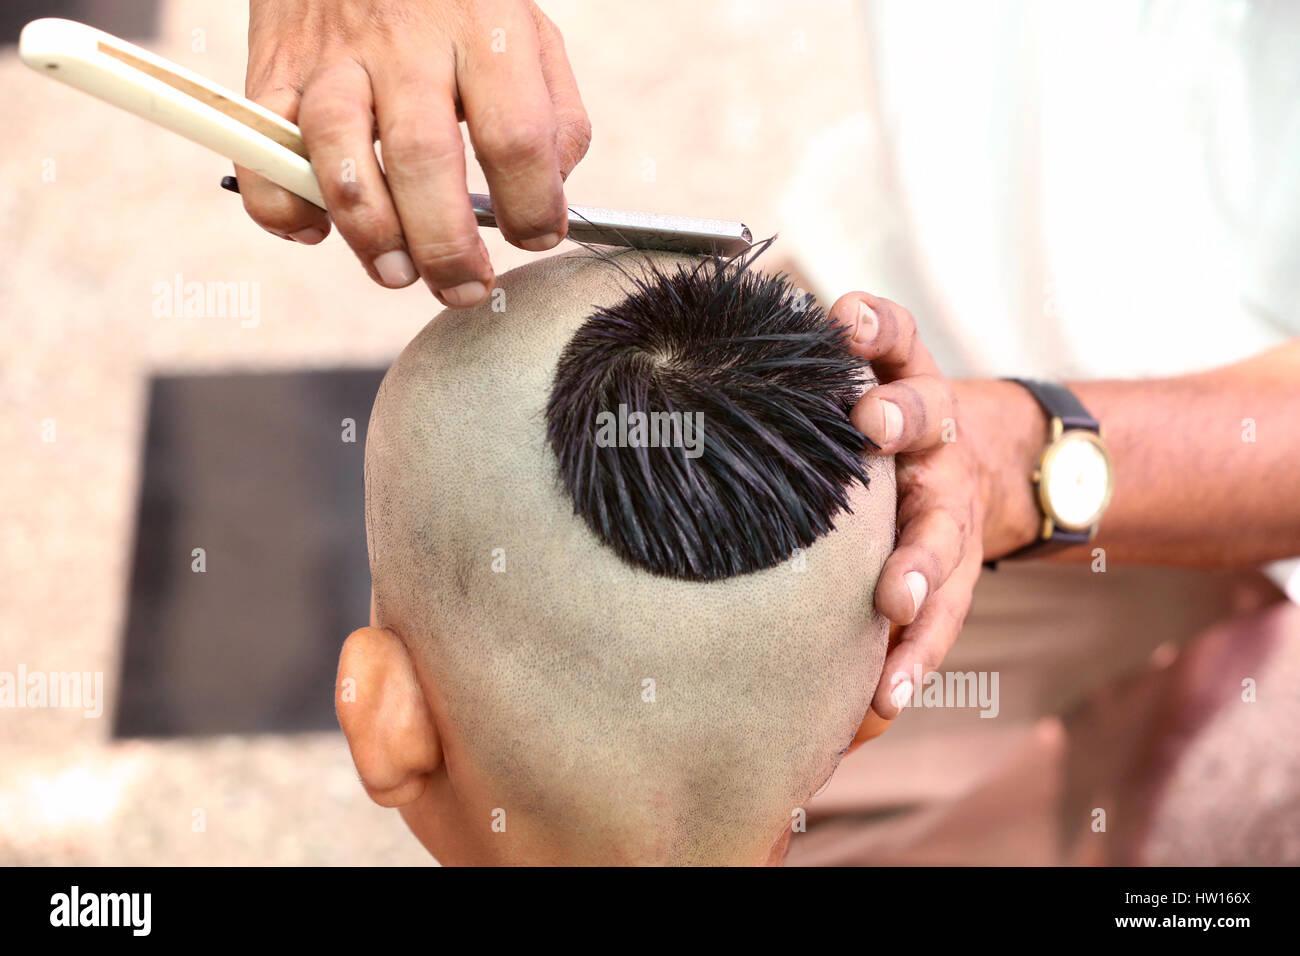 Getting a hair-cut for thread ceremony, Upanayana, a Hindu ritual